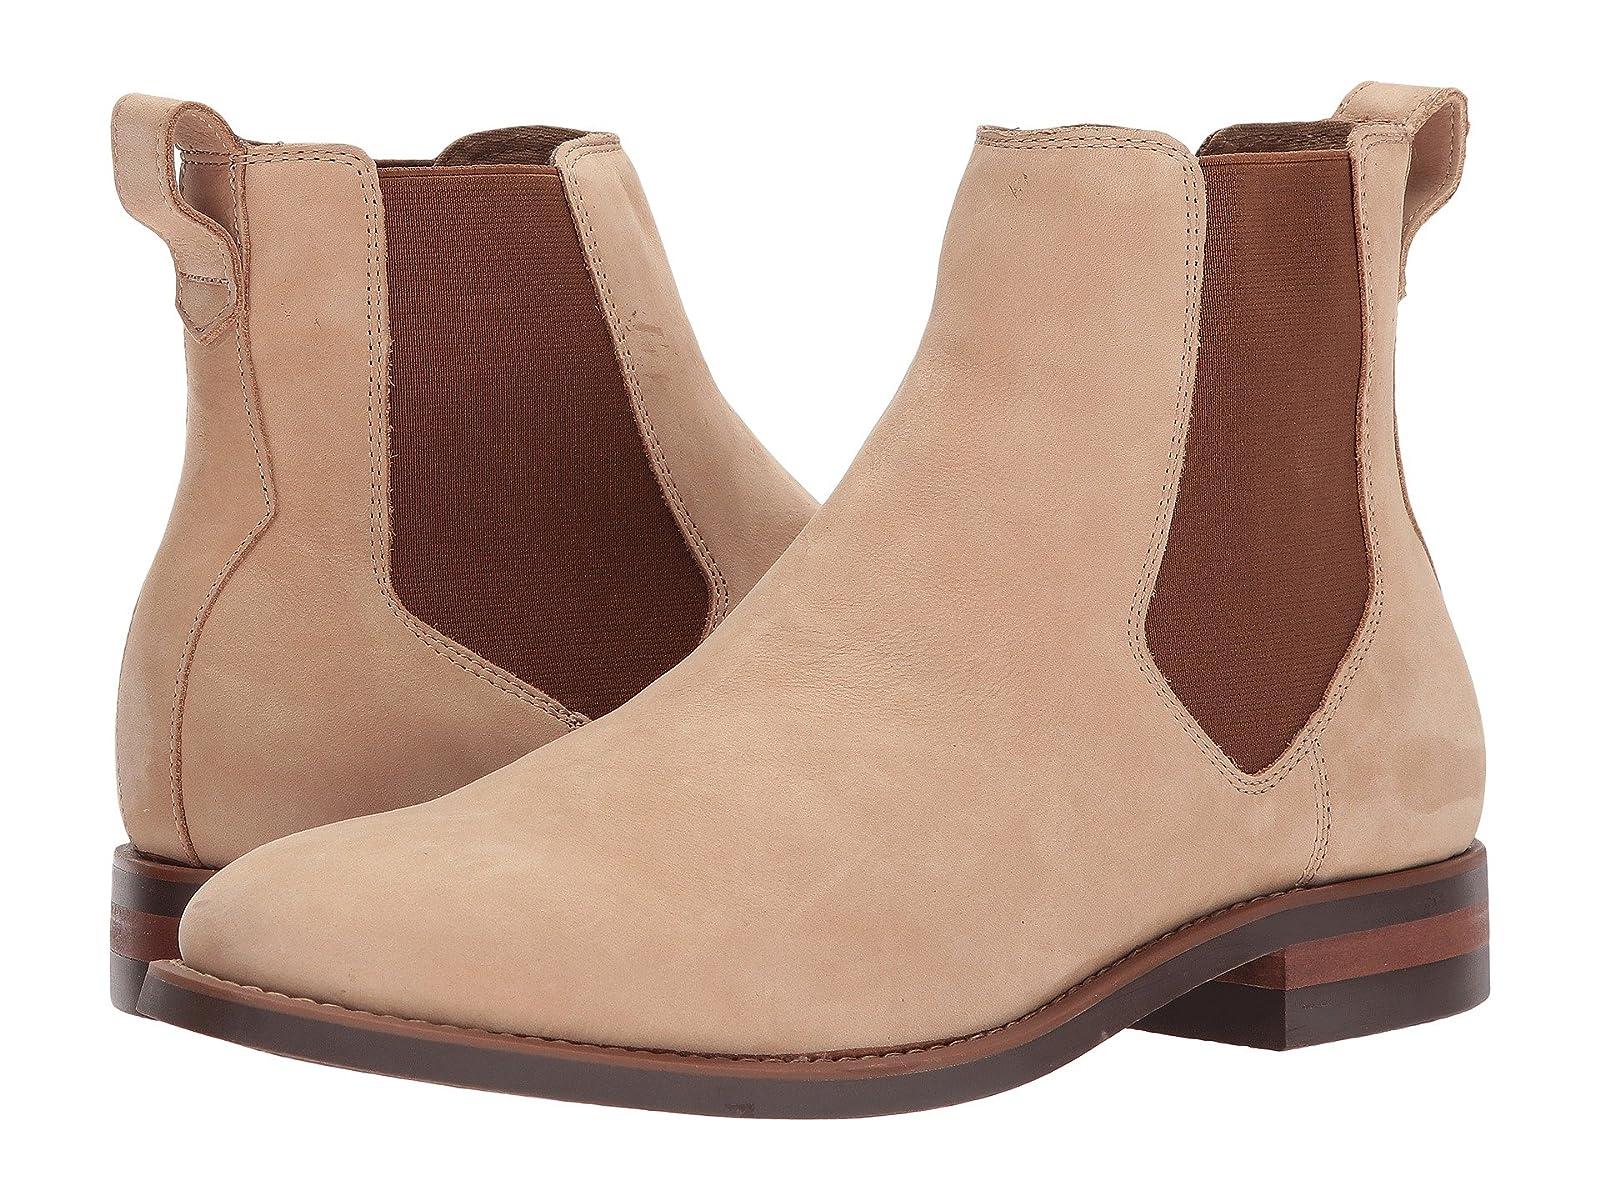 ALDO GilmontCheap and distinctive eye-catching shoes